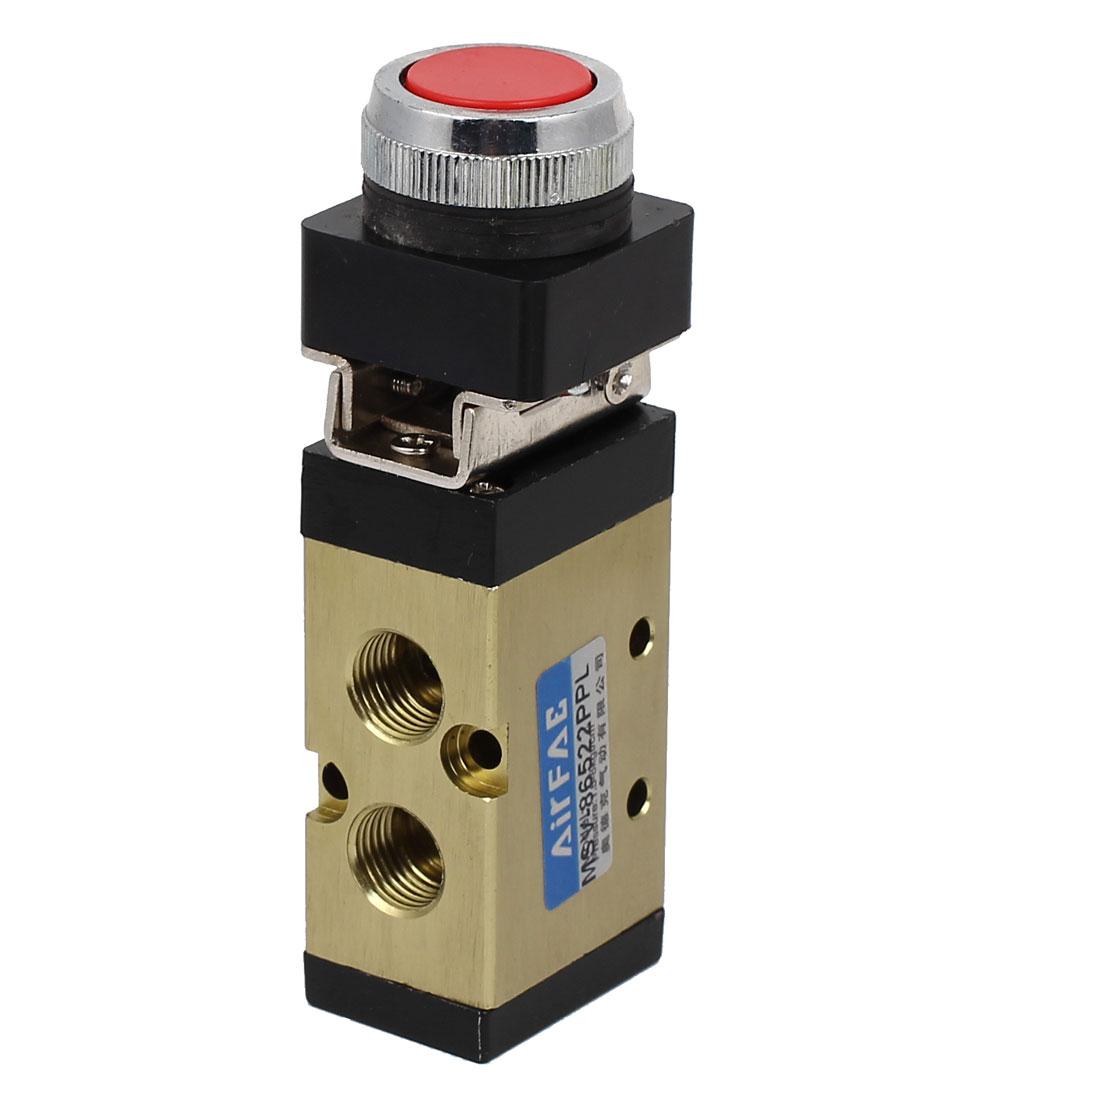 MSV86522PPL 1/4BSP 5 Way 2 Position Momentary Flat Push Button Pneumatic Mechanical Valve